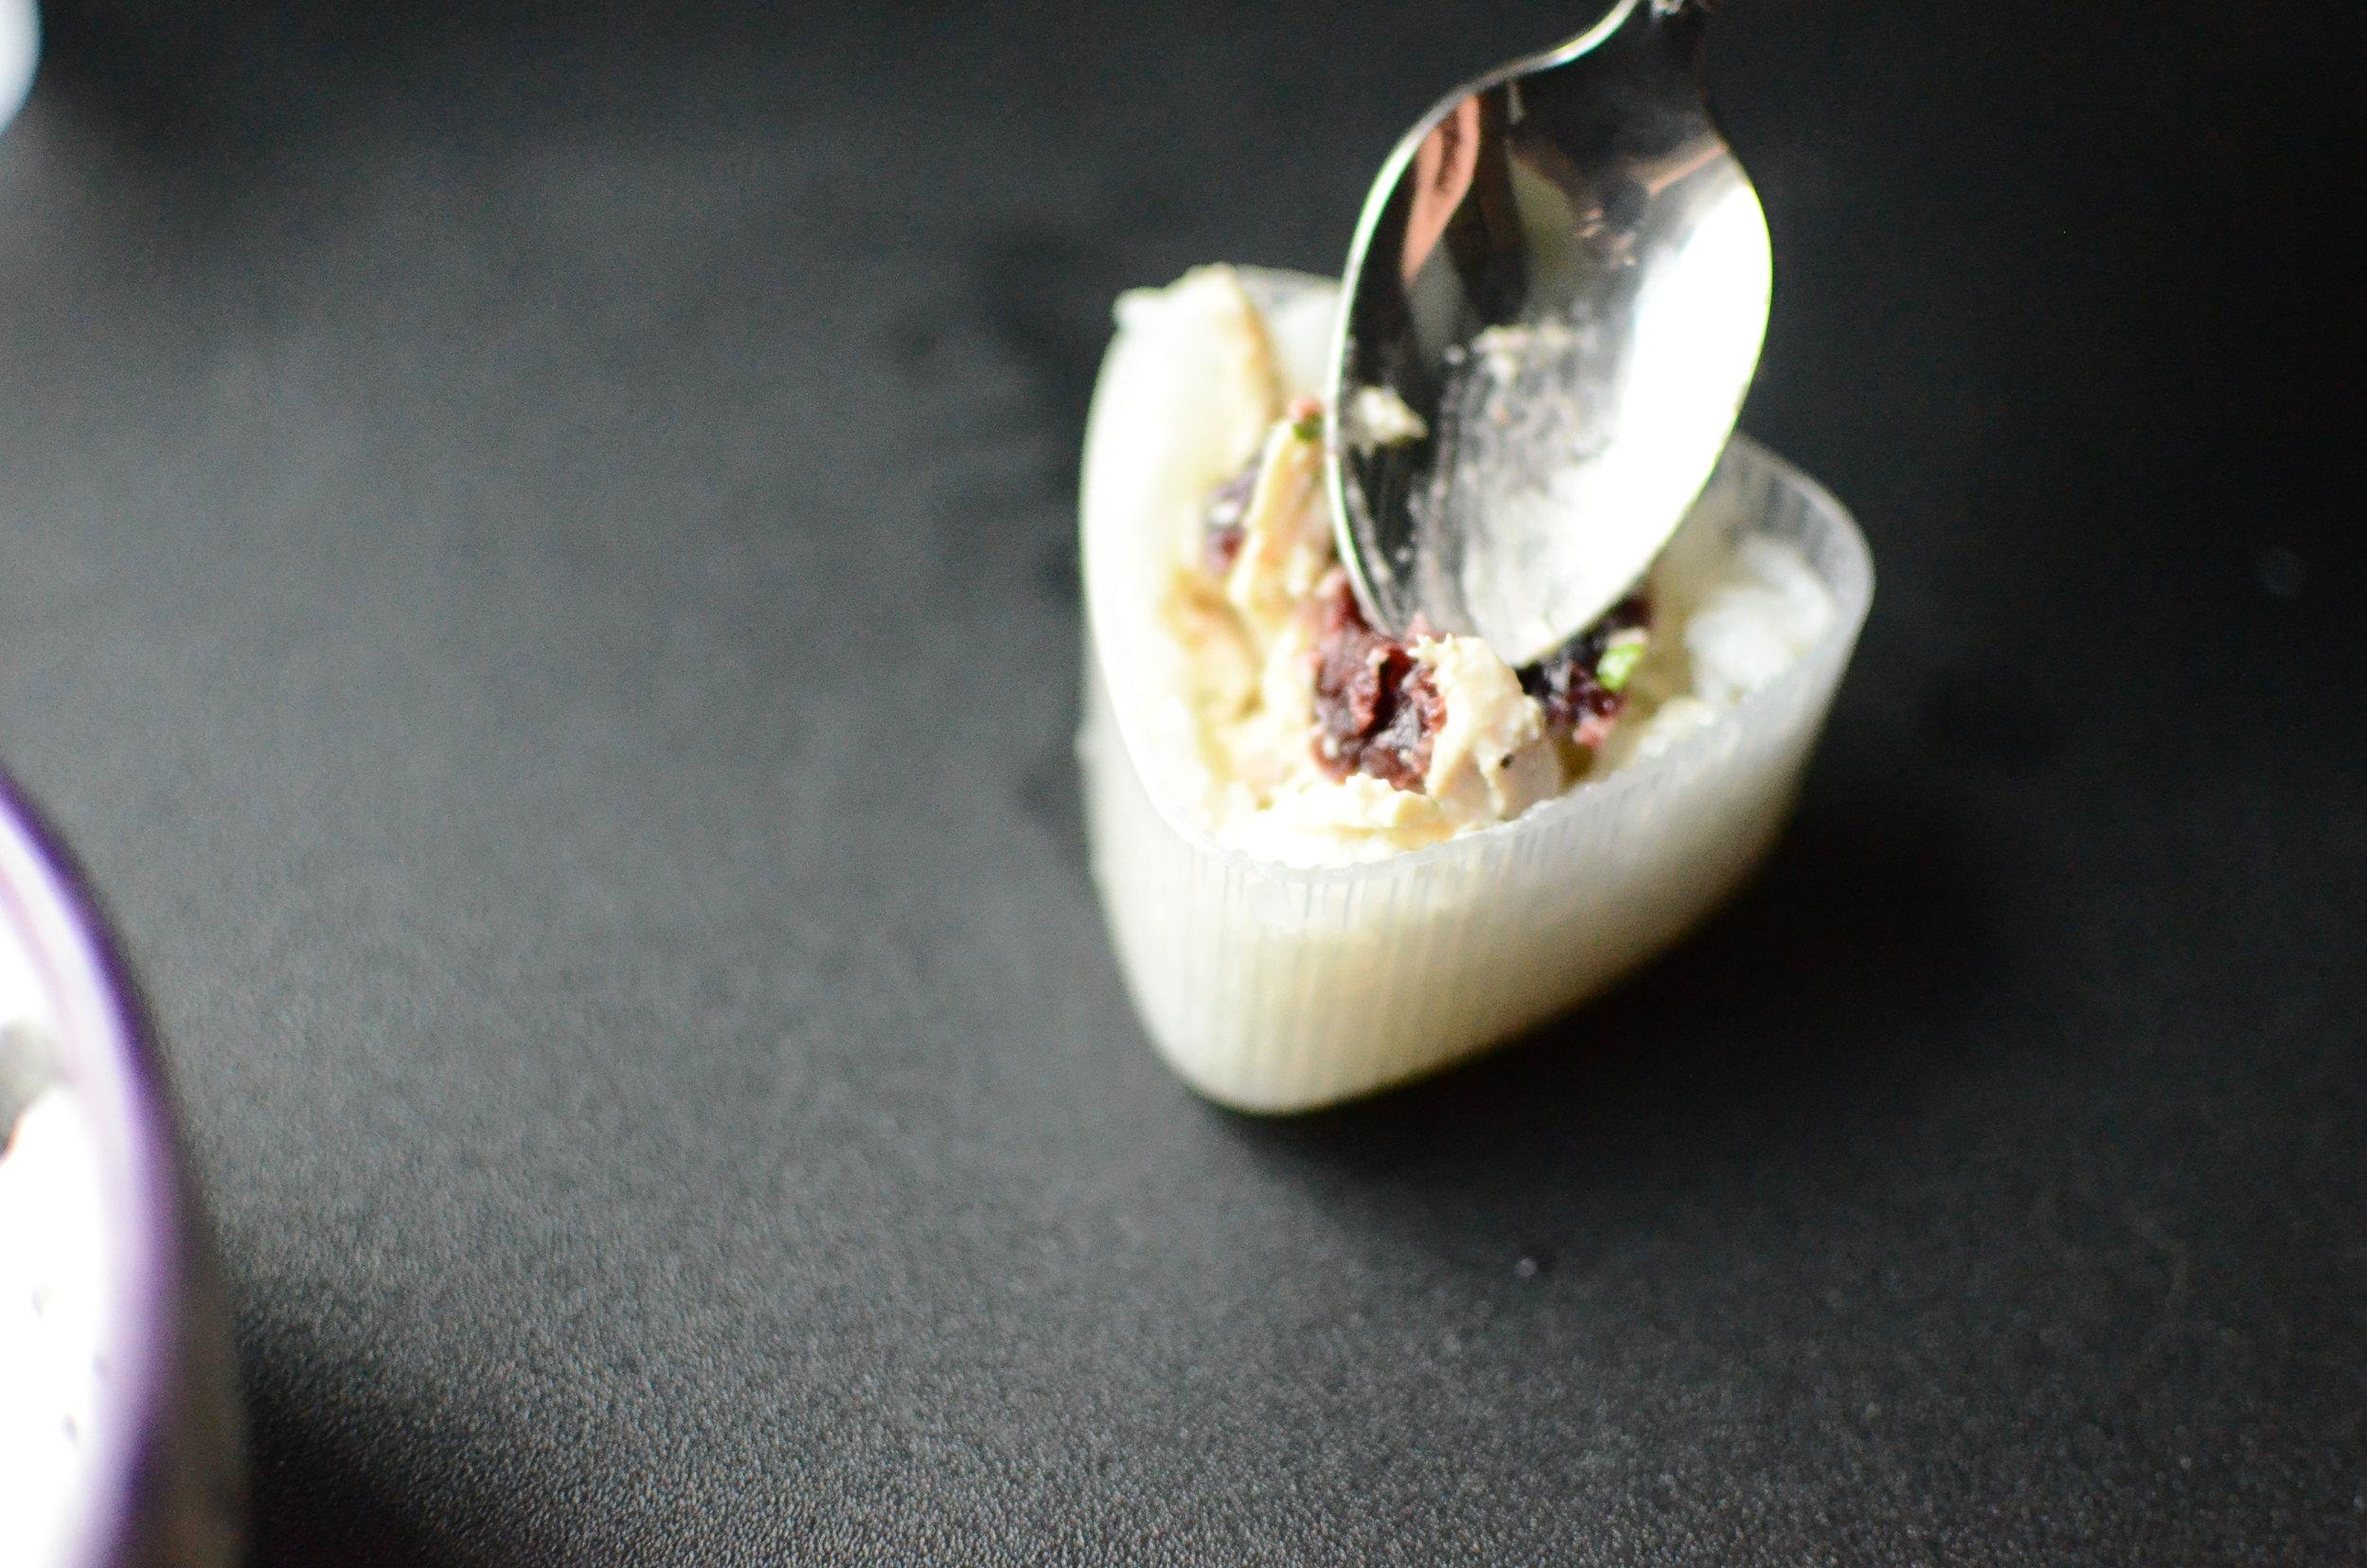 how to make onigiri, o-musubi, nigirimeshi (japanese rice balls) - recipe with how-to photos